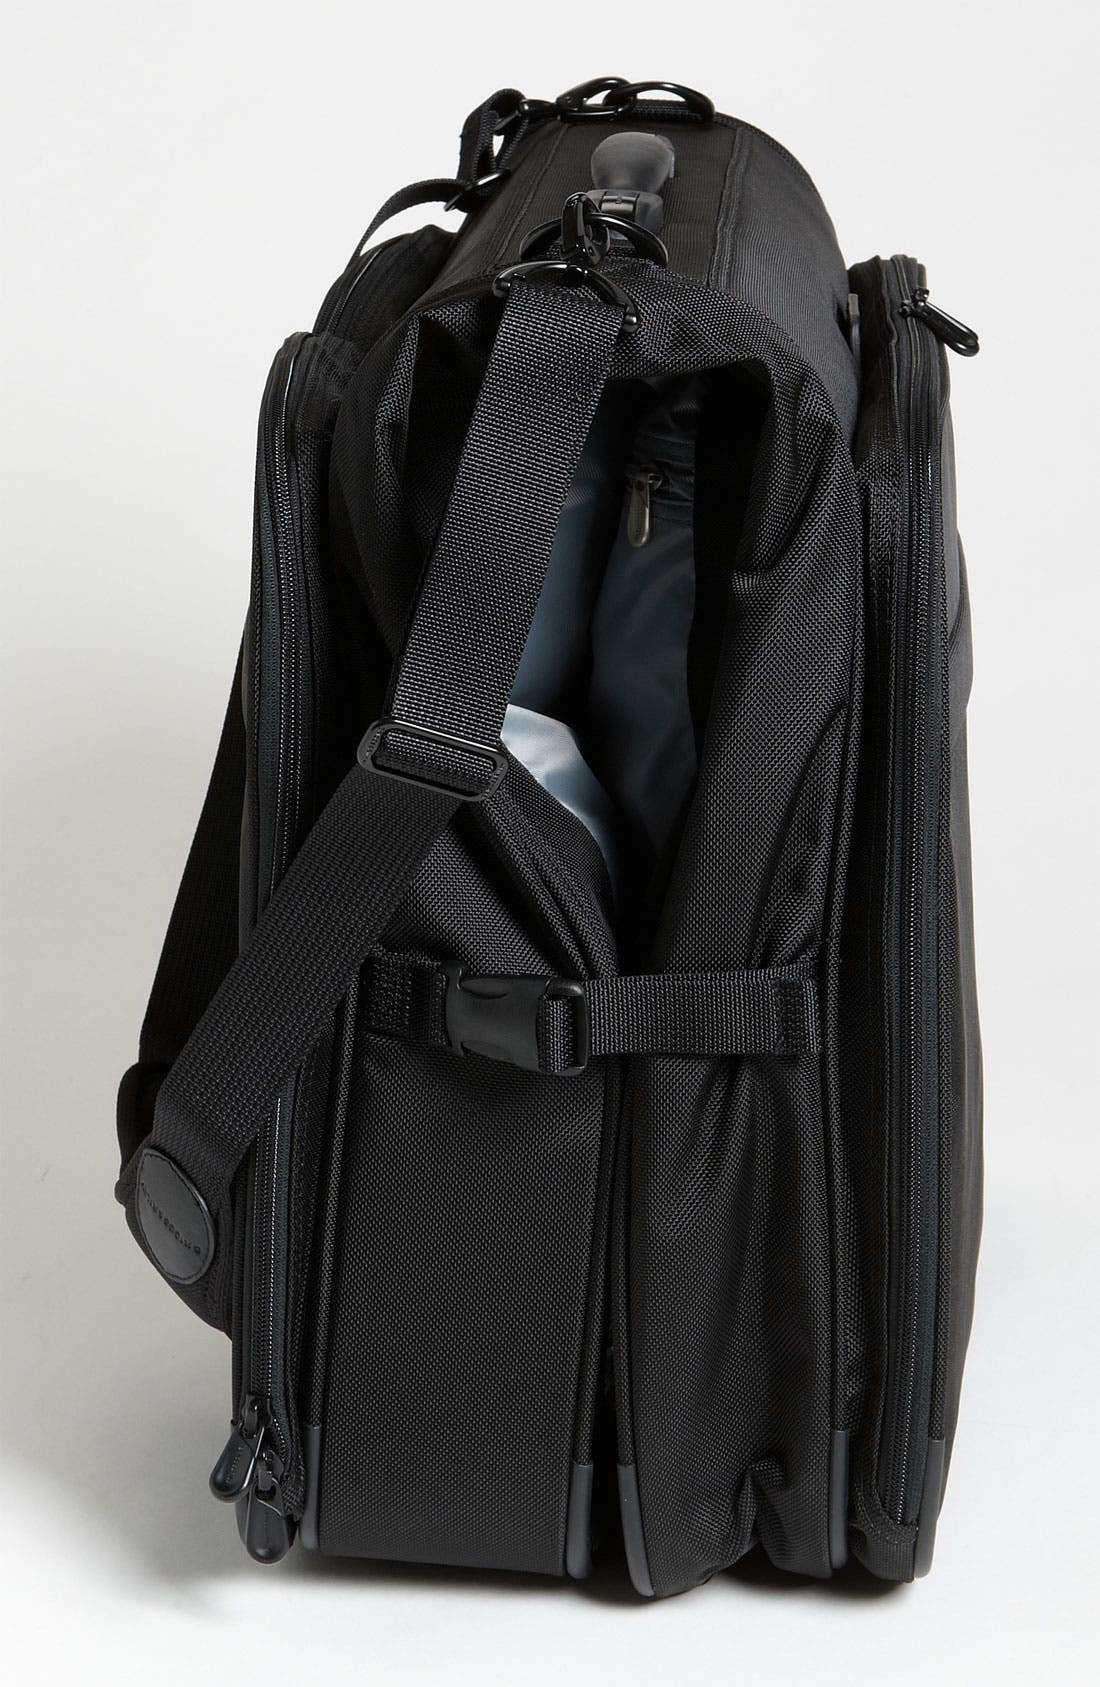 Alternate Image 2  - Briggs & Riley 'Baseline - Deluxe' Garment Bag (22 Inch)